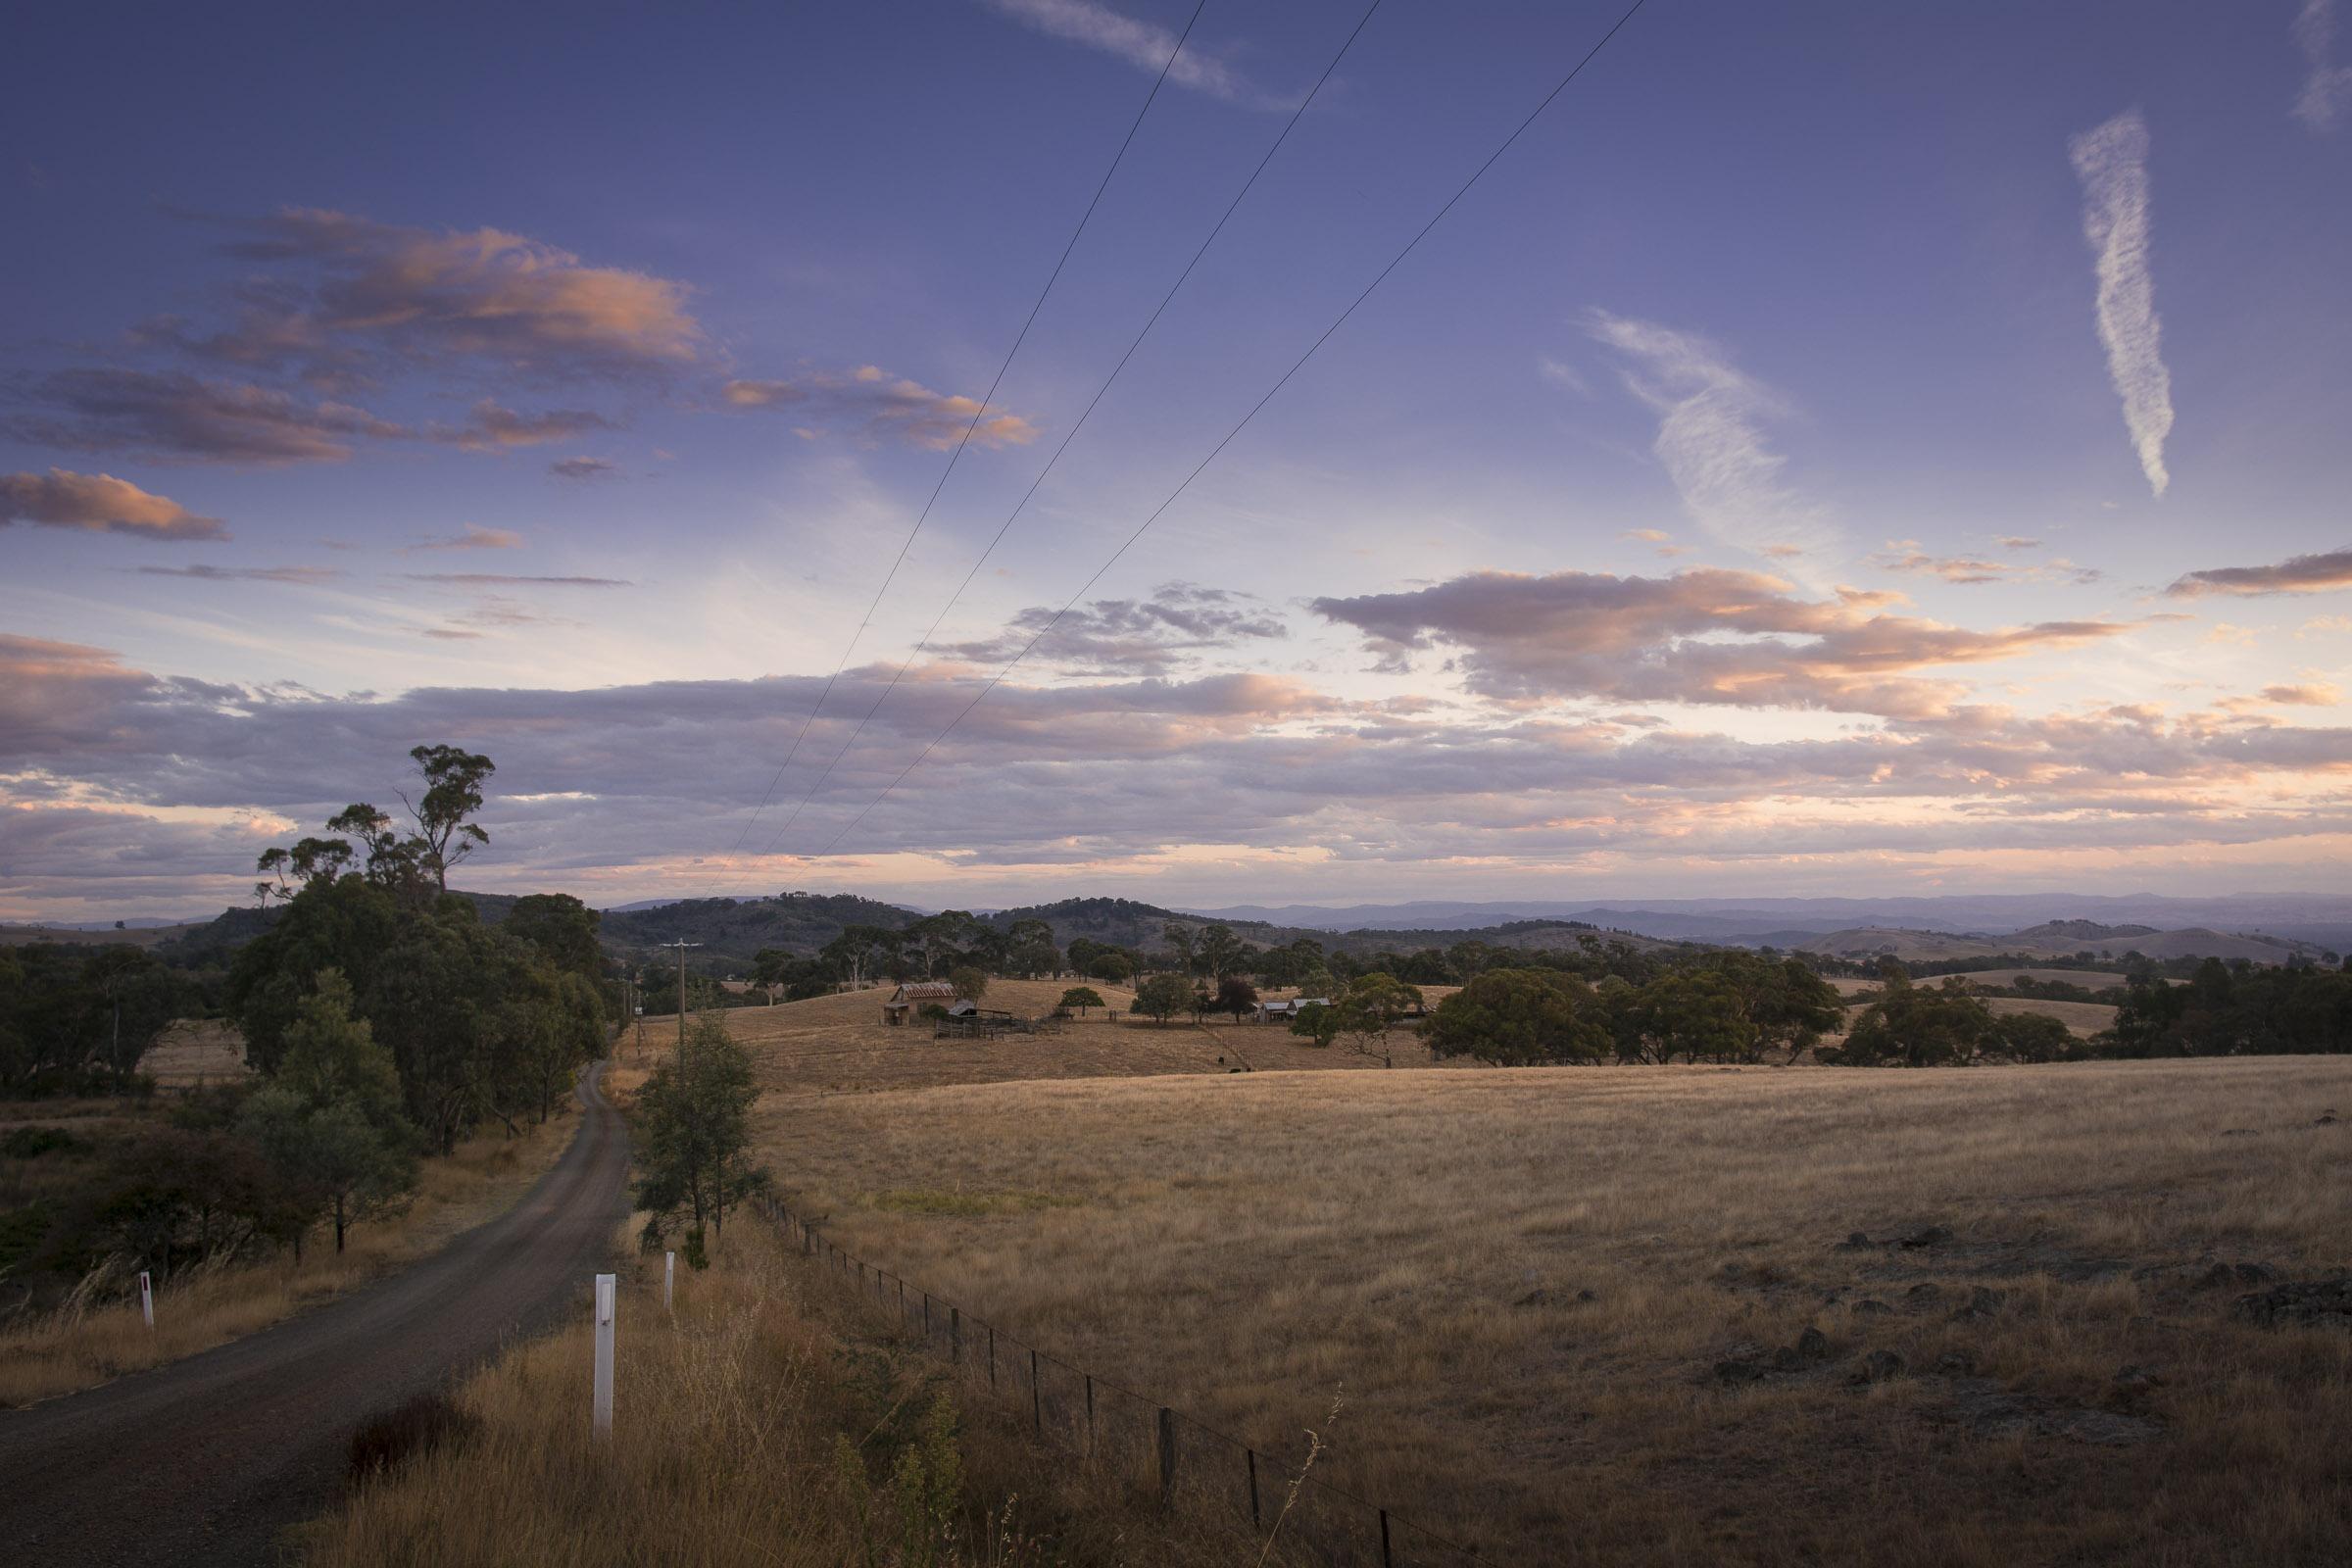 Looking south from Wangaratta-Beechworth road